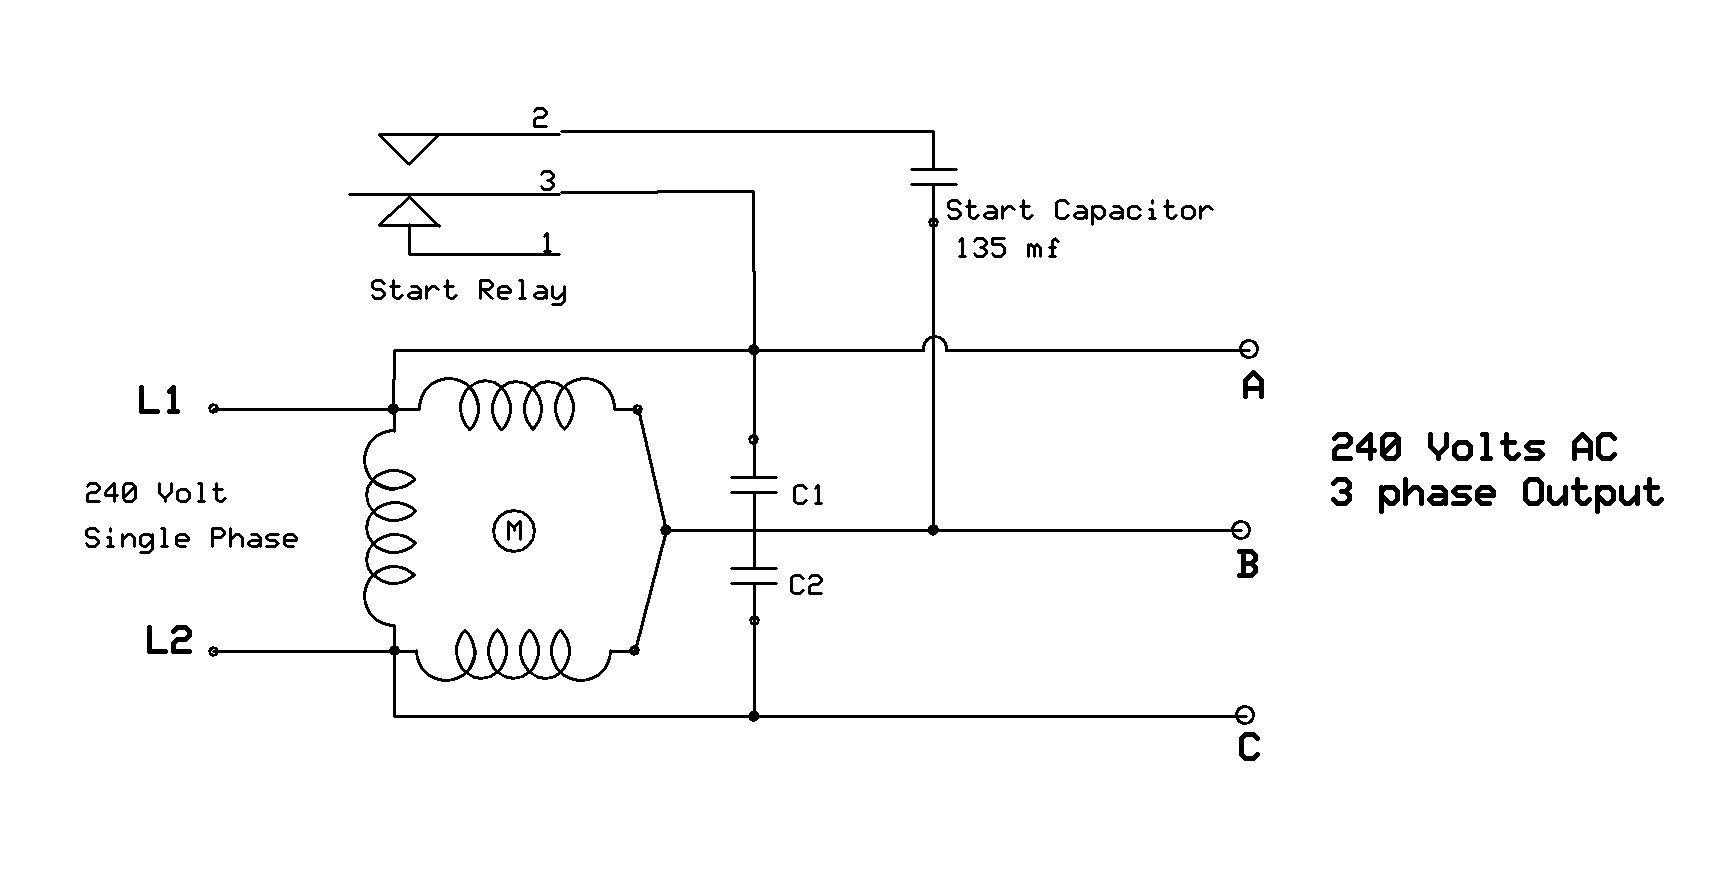 hight resolution of stunning 230v 3 phase motor wiring diagram 51 ge dryer 1